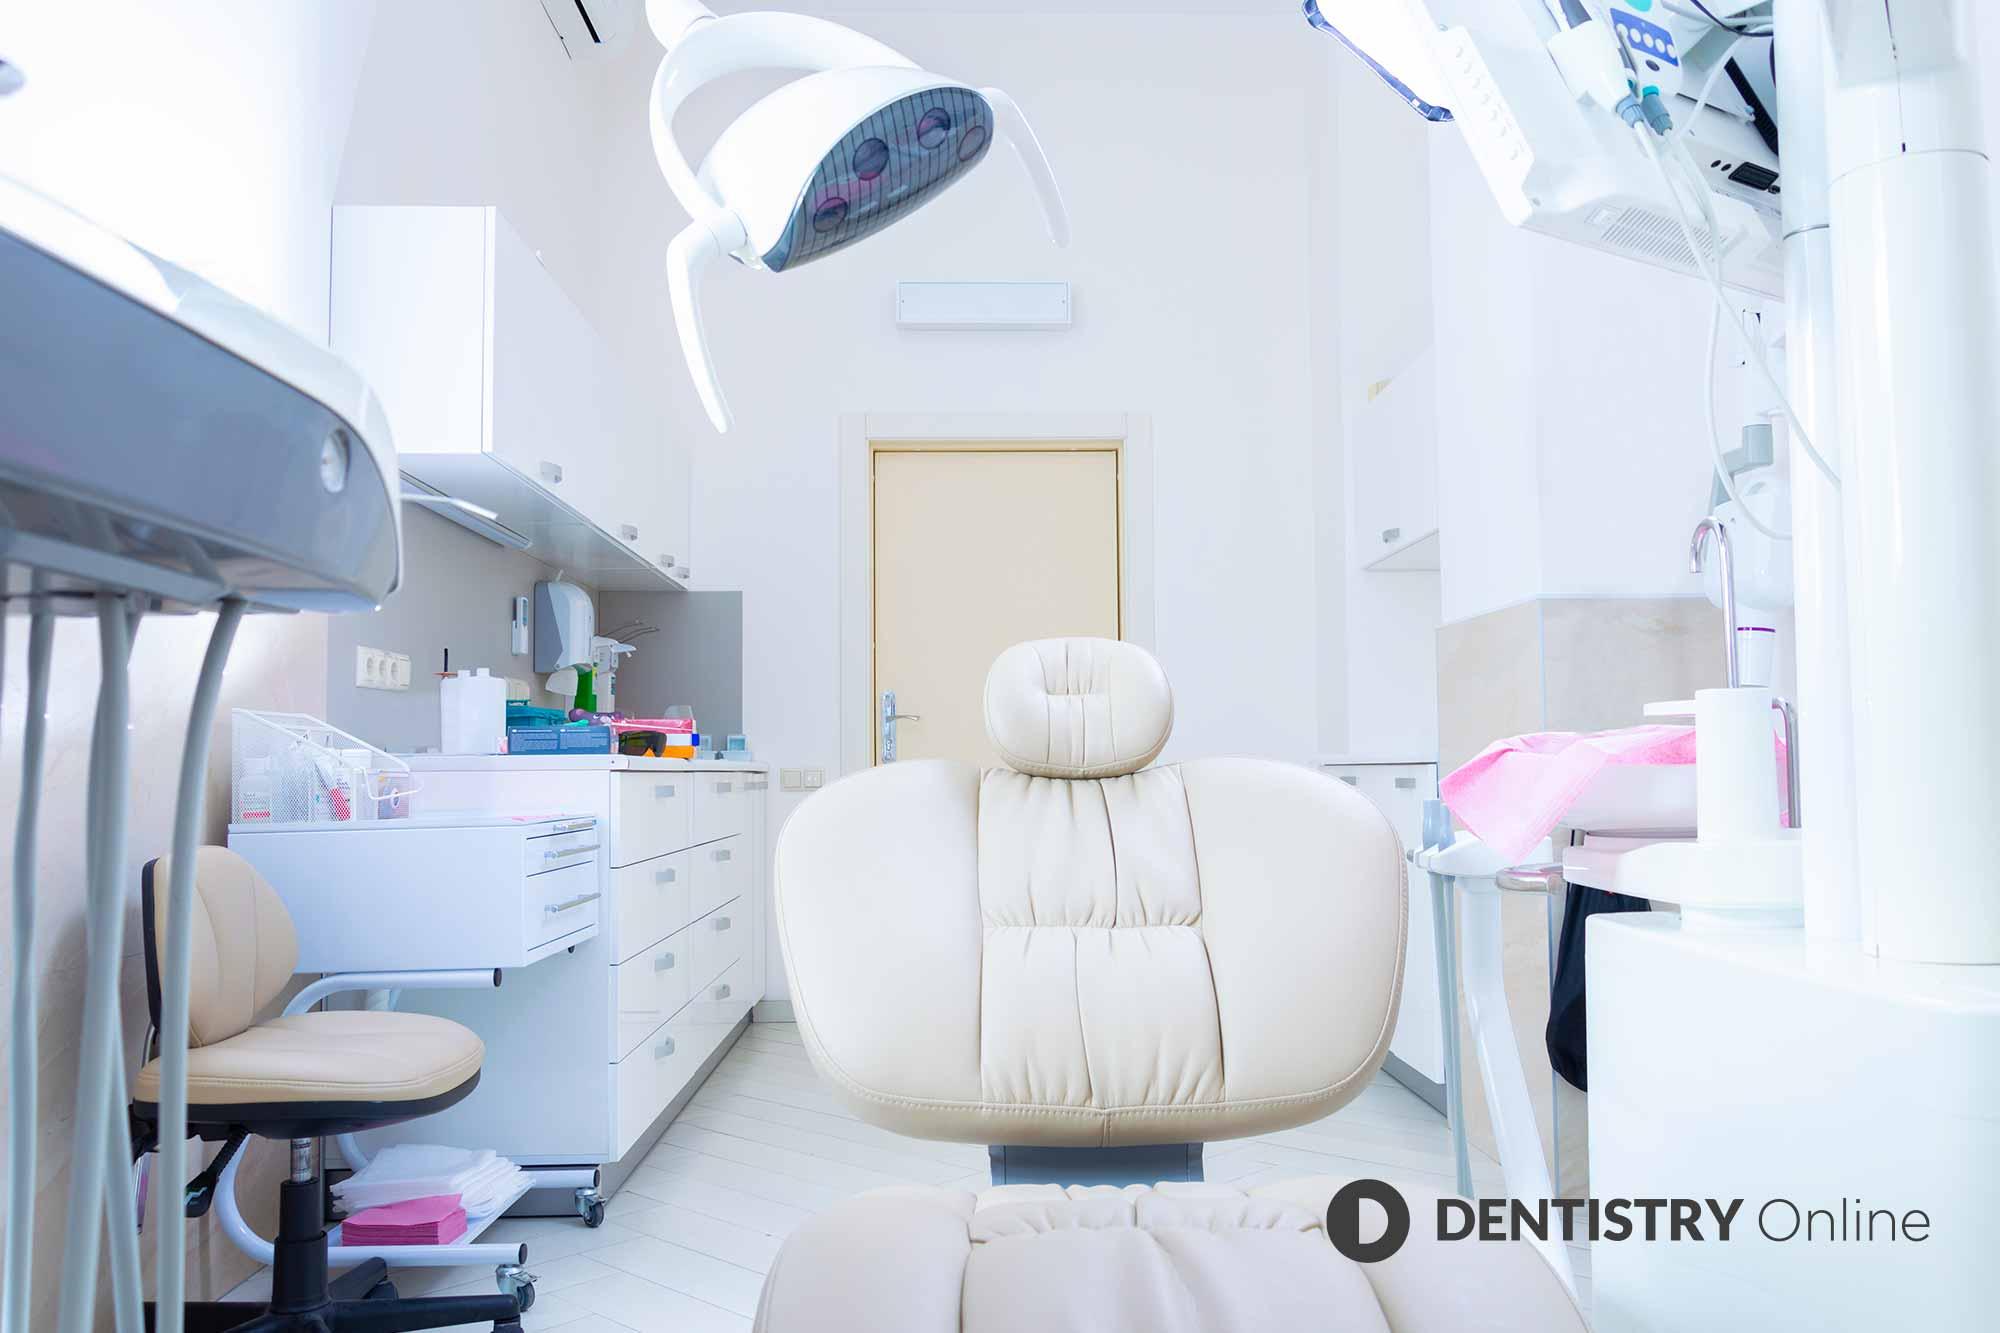 air sterilisation in a dental practice